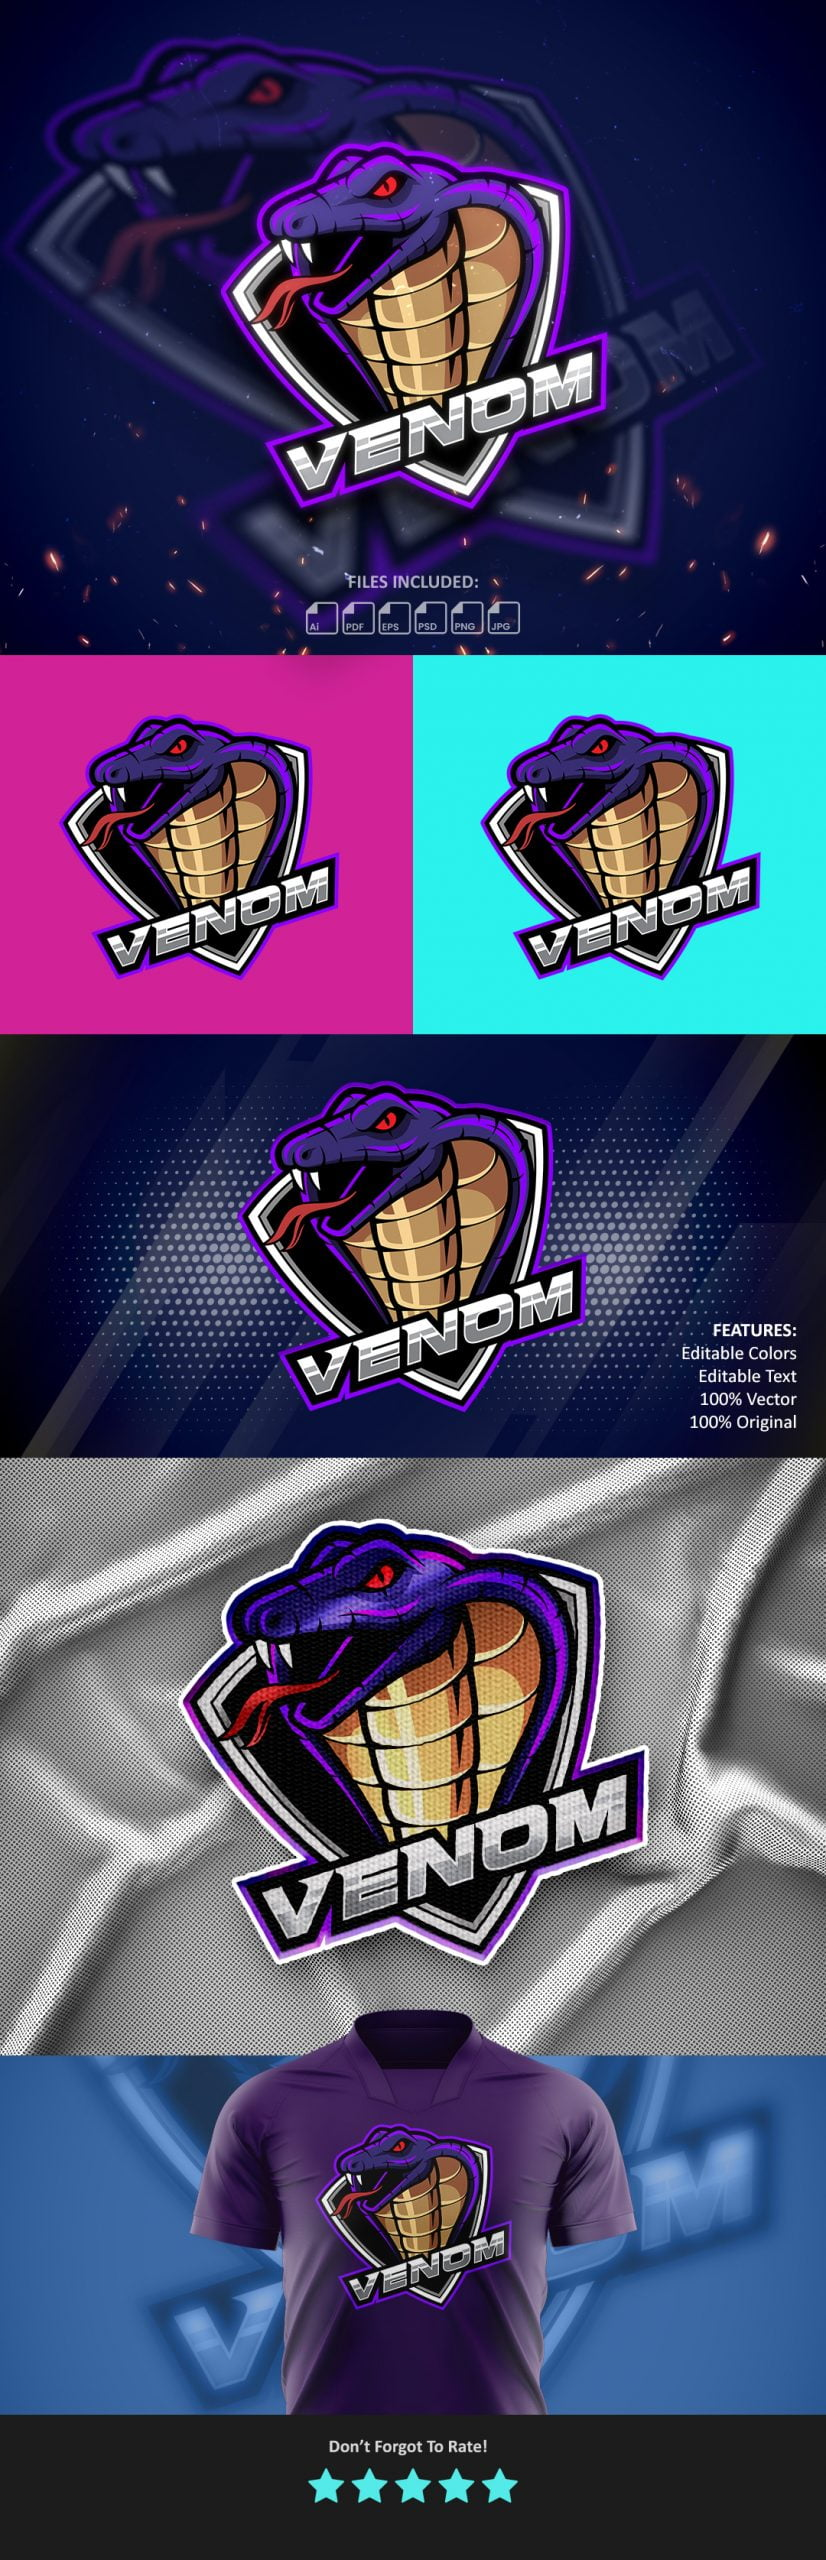 Venom-Esports-Mascot-Gaming-Logo